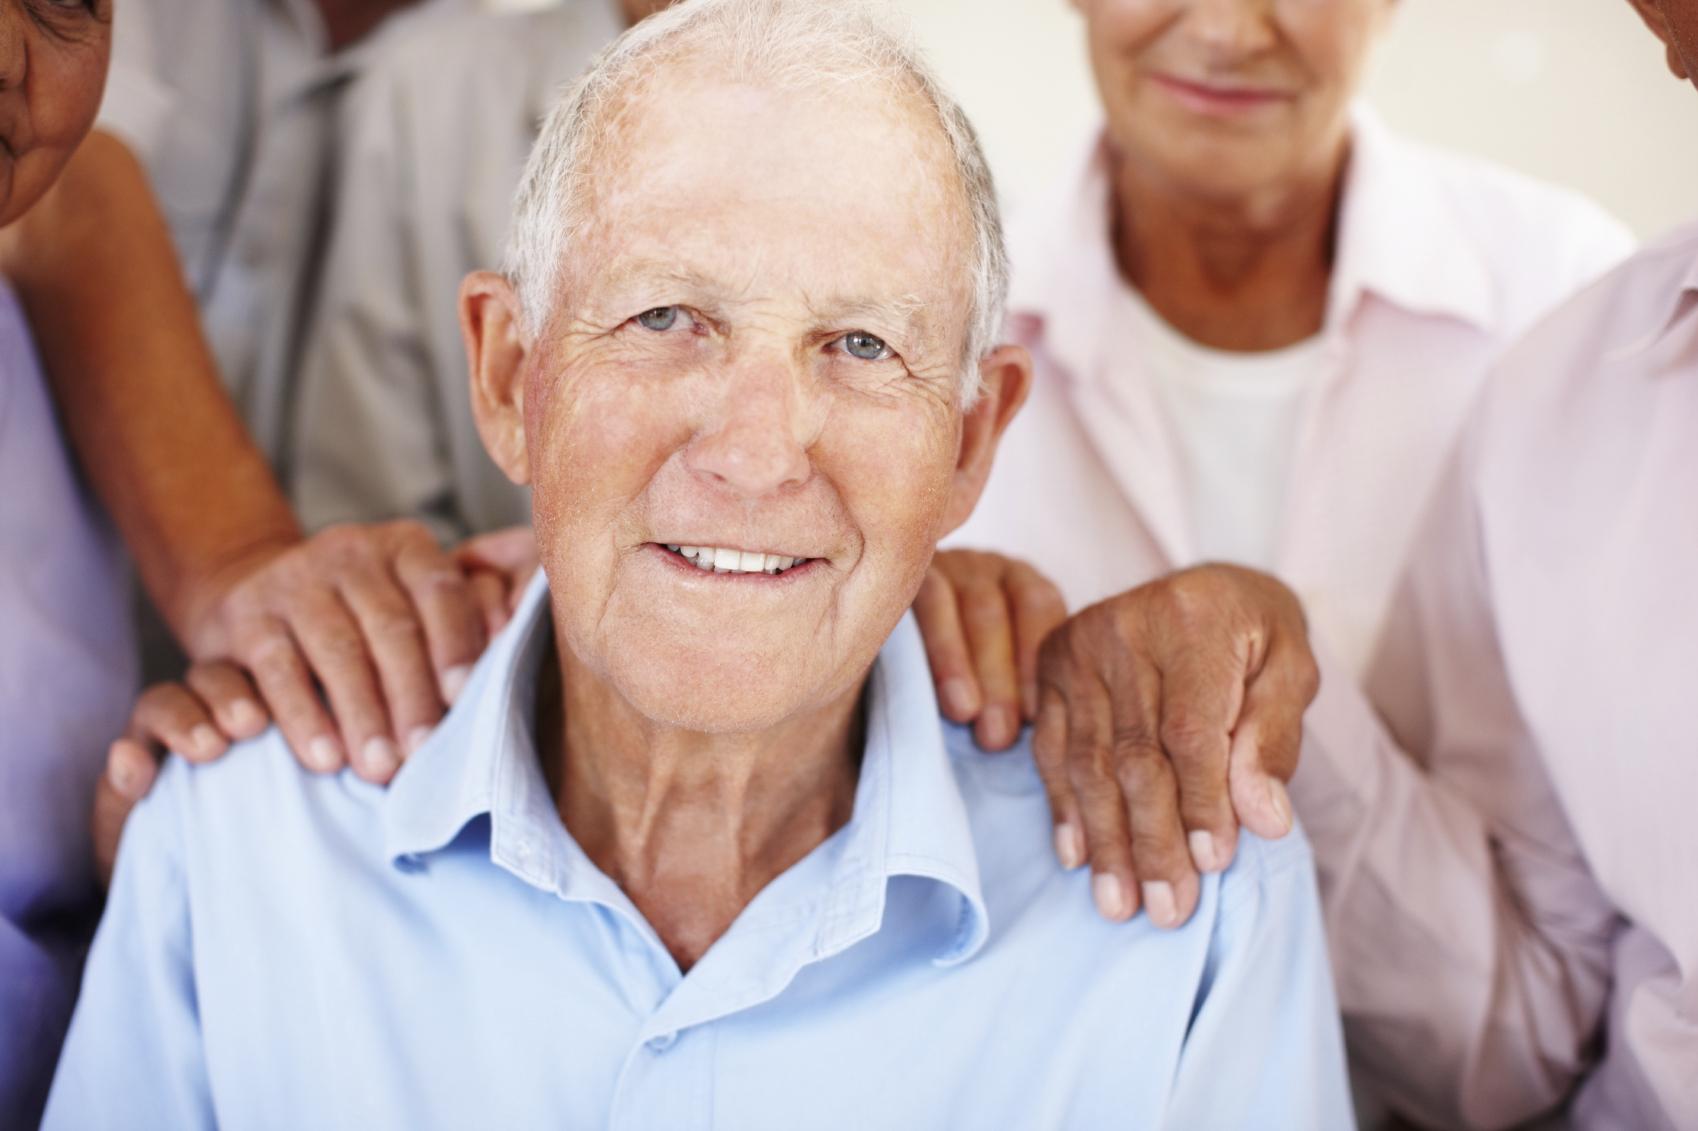 Most Secure Senior Online Dating Site